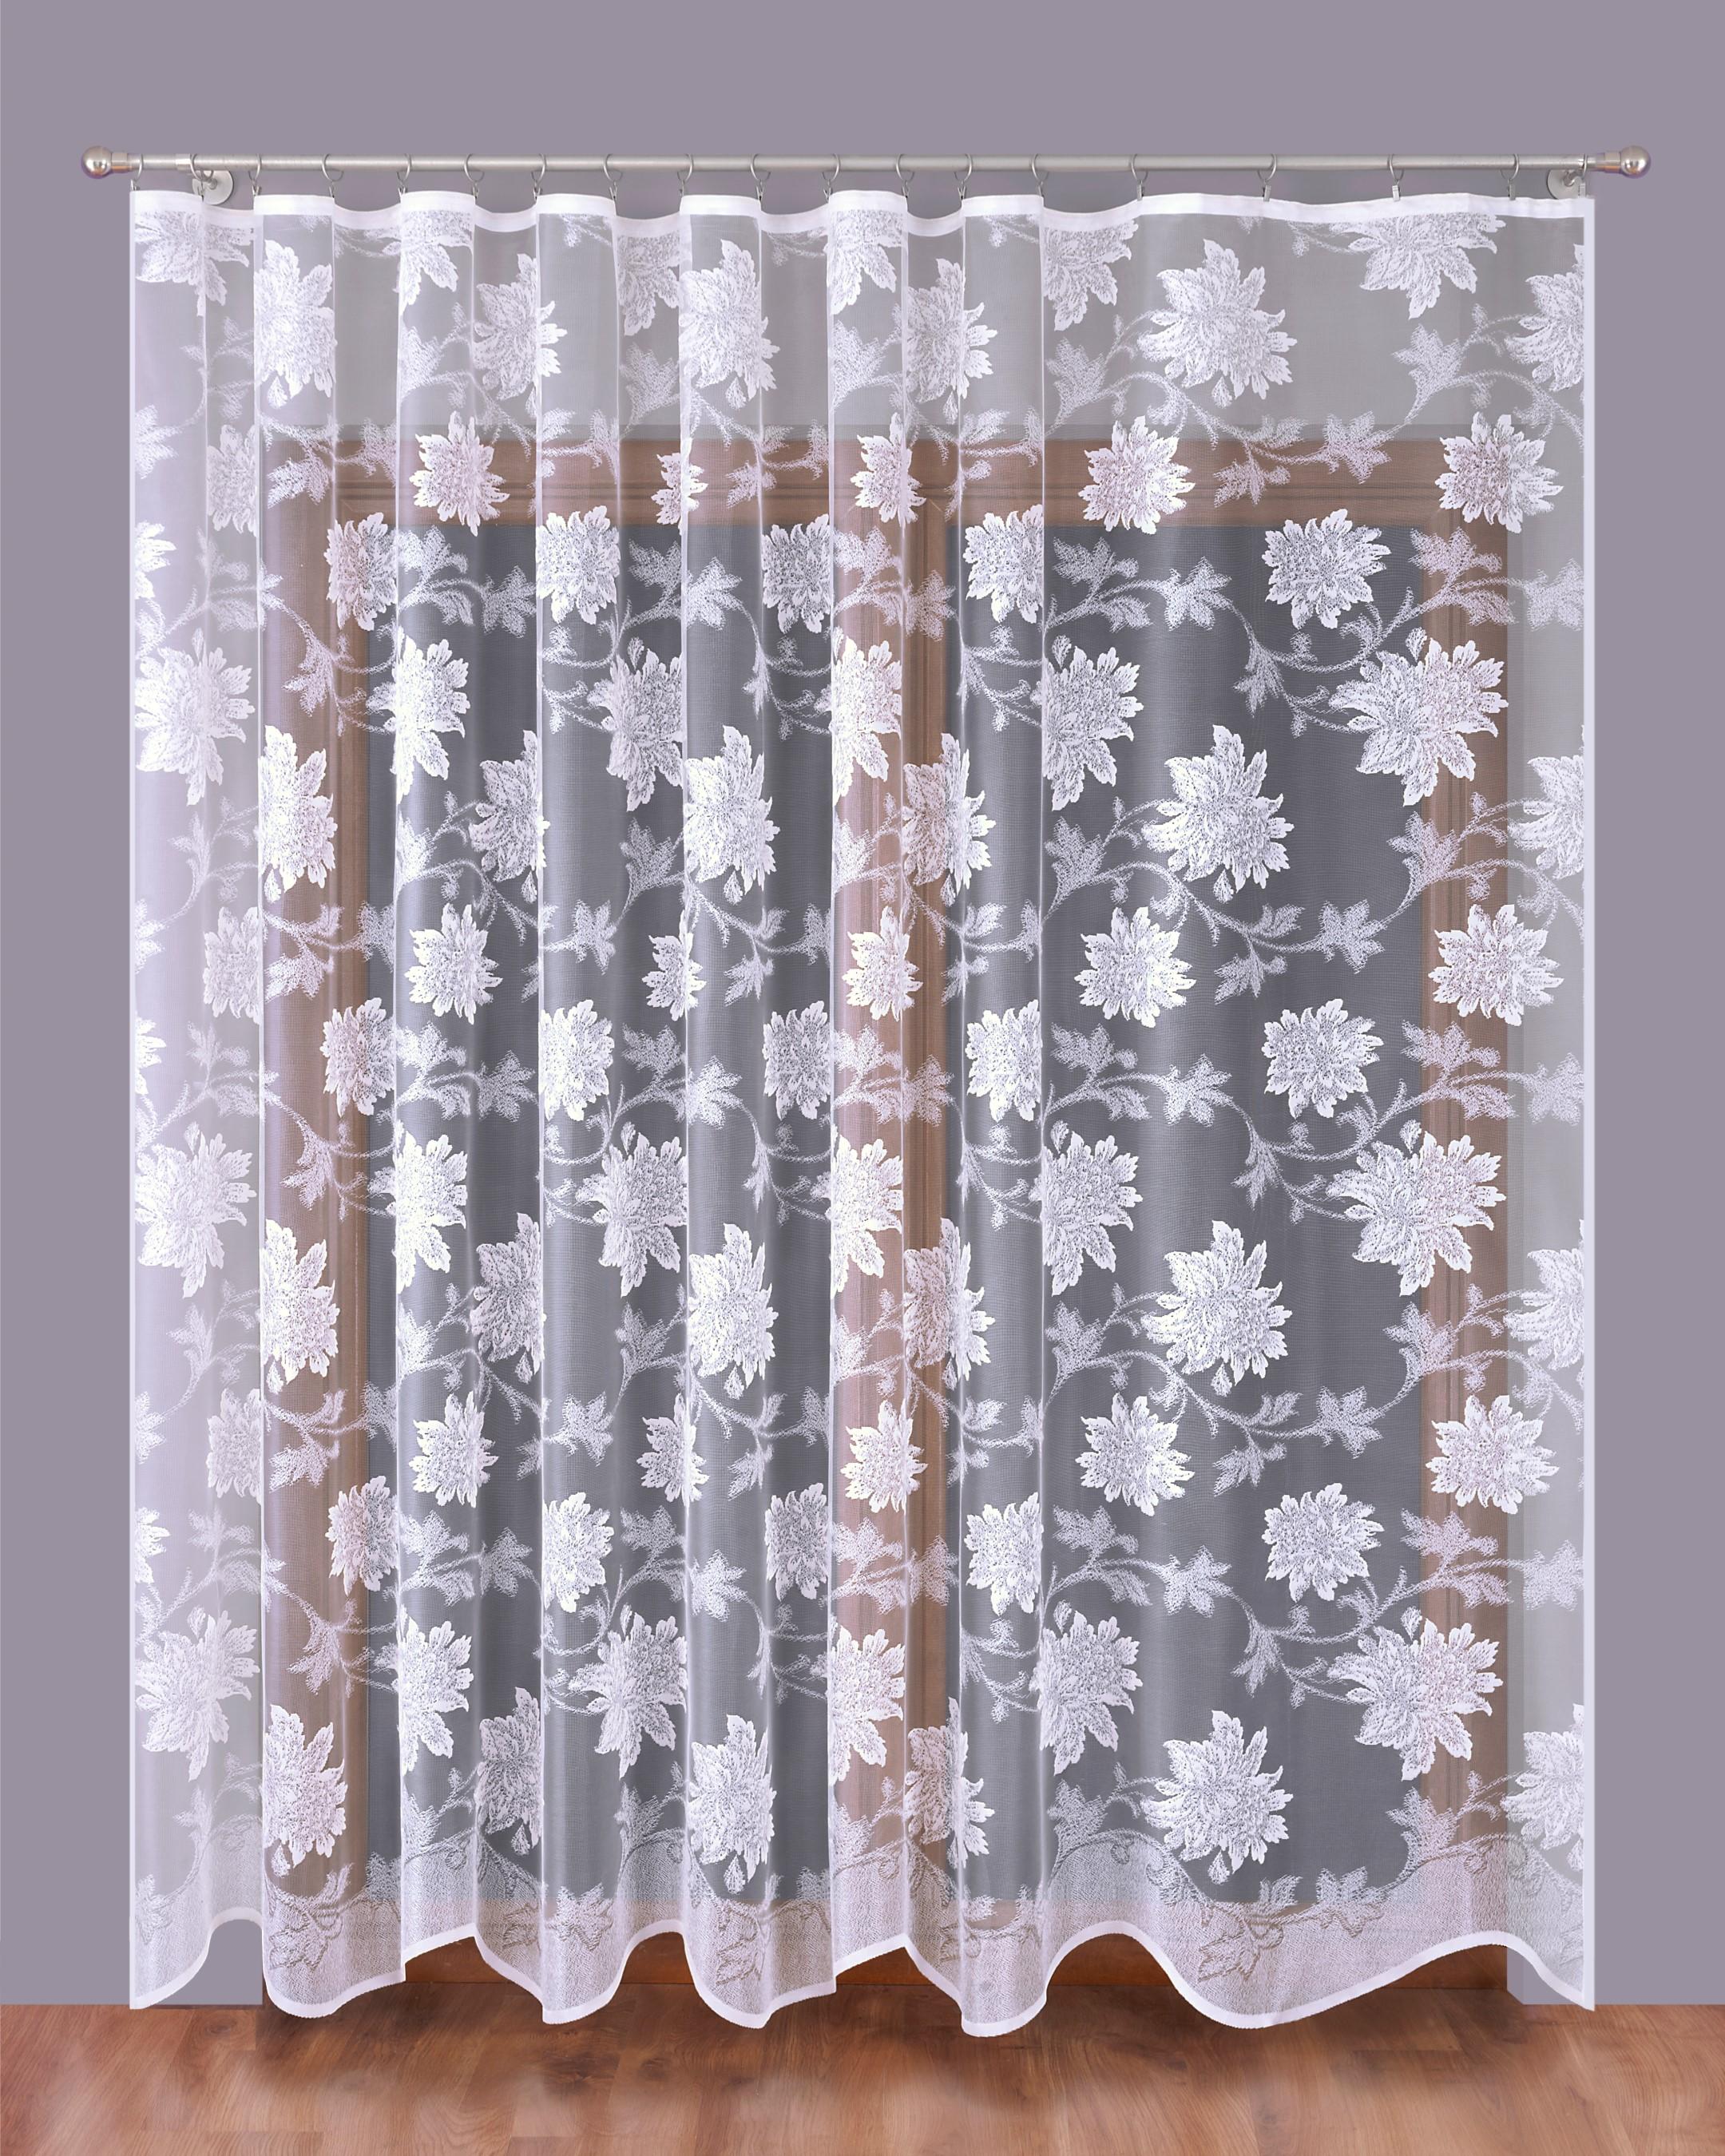 Шторы Primavera Классические шторы Larry Цвет: Белый шторы primavera классические шторы larry цвет белый